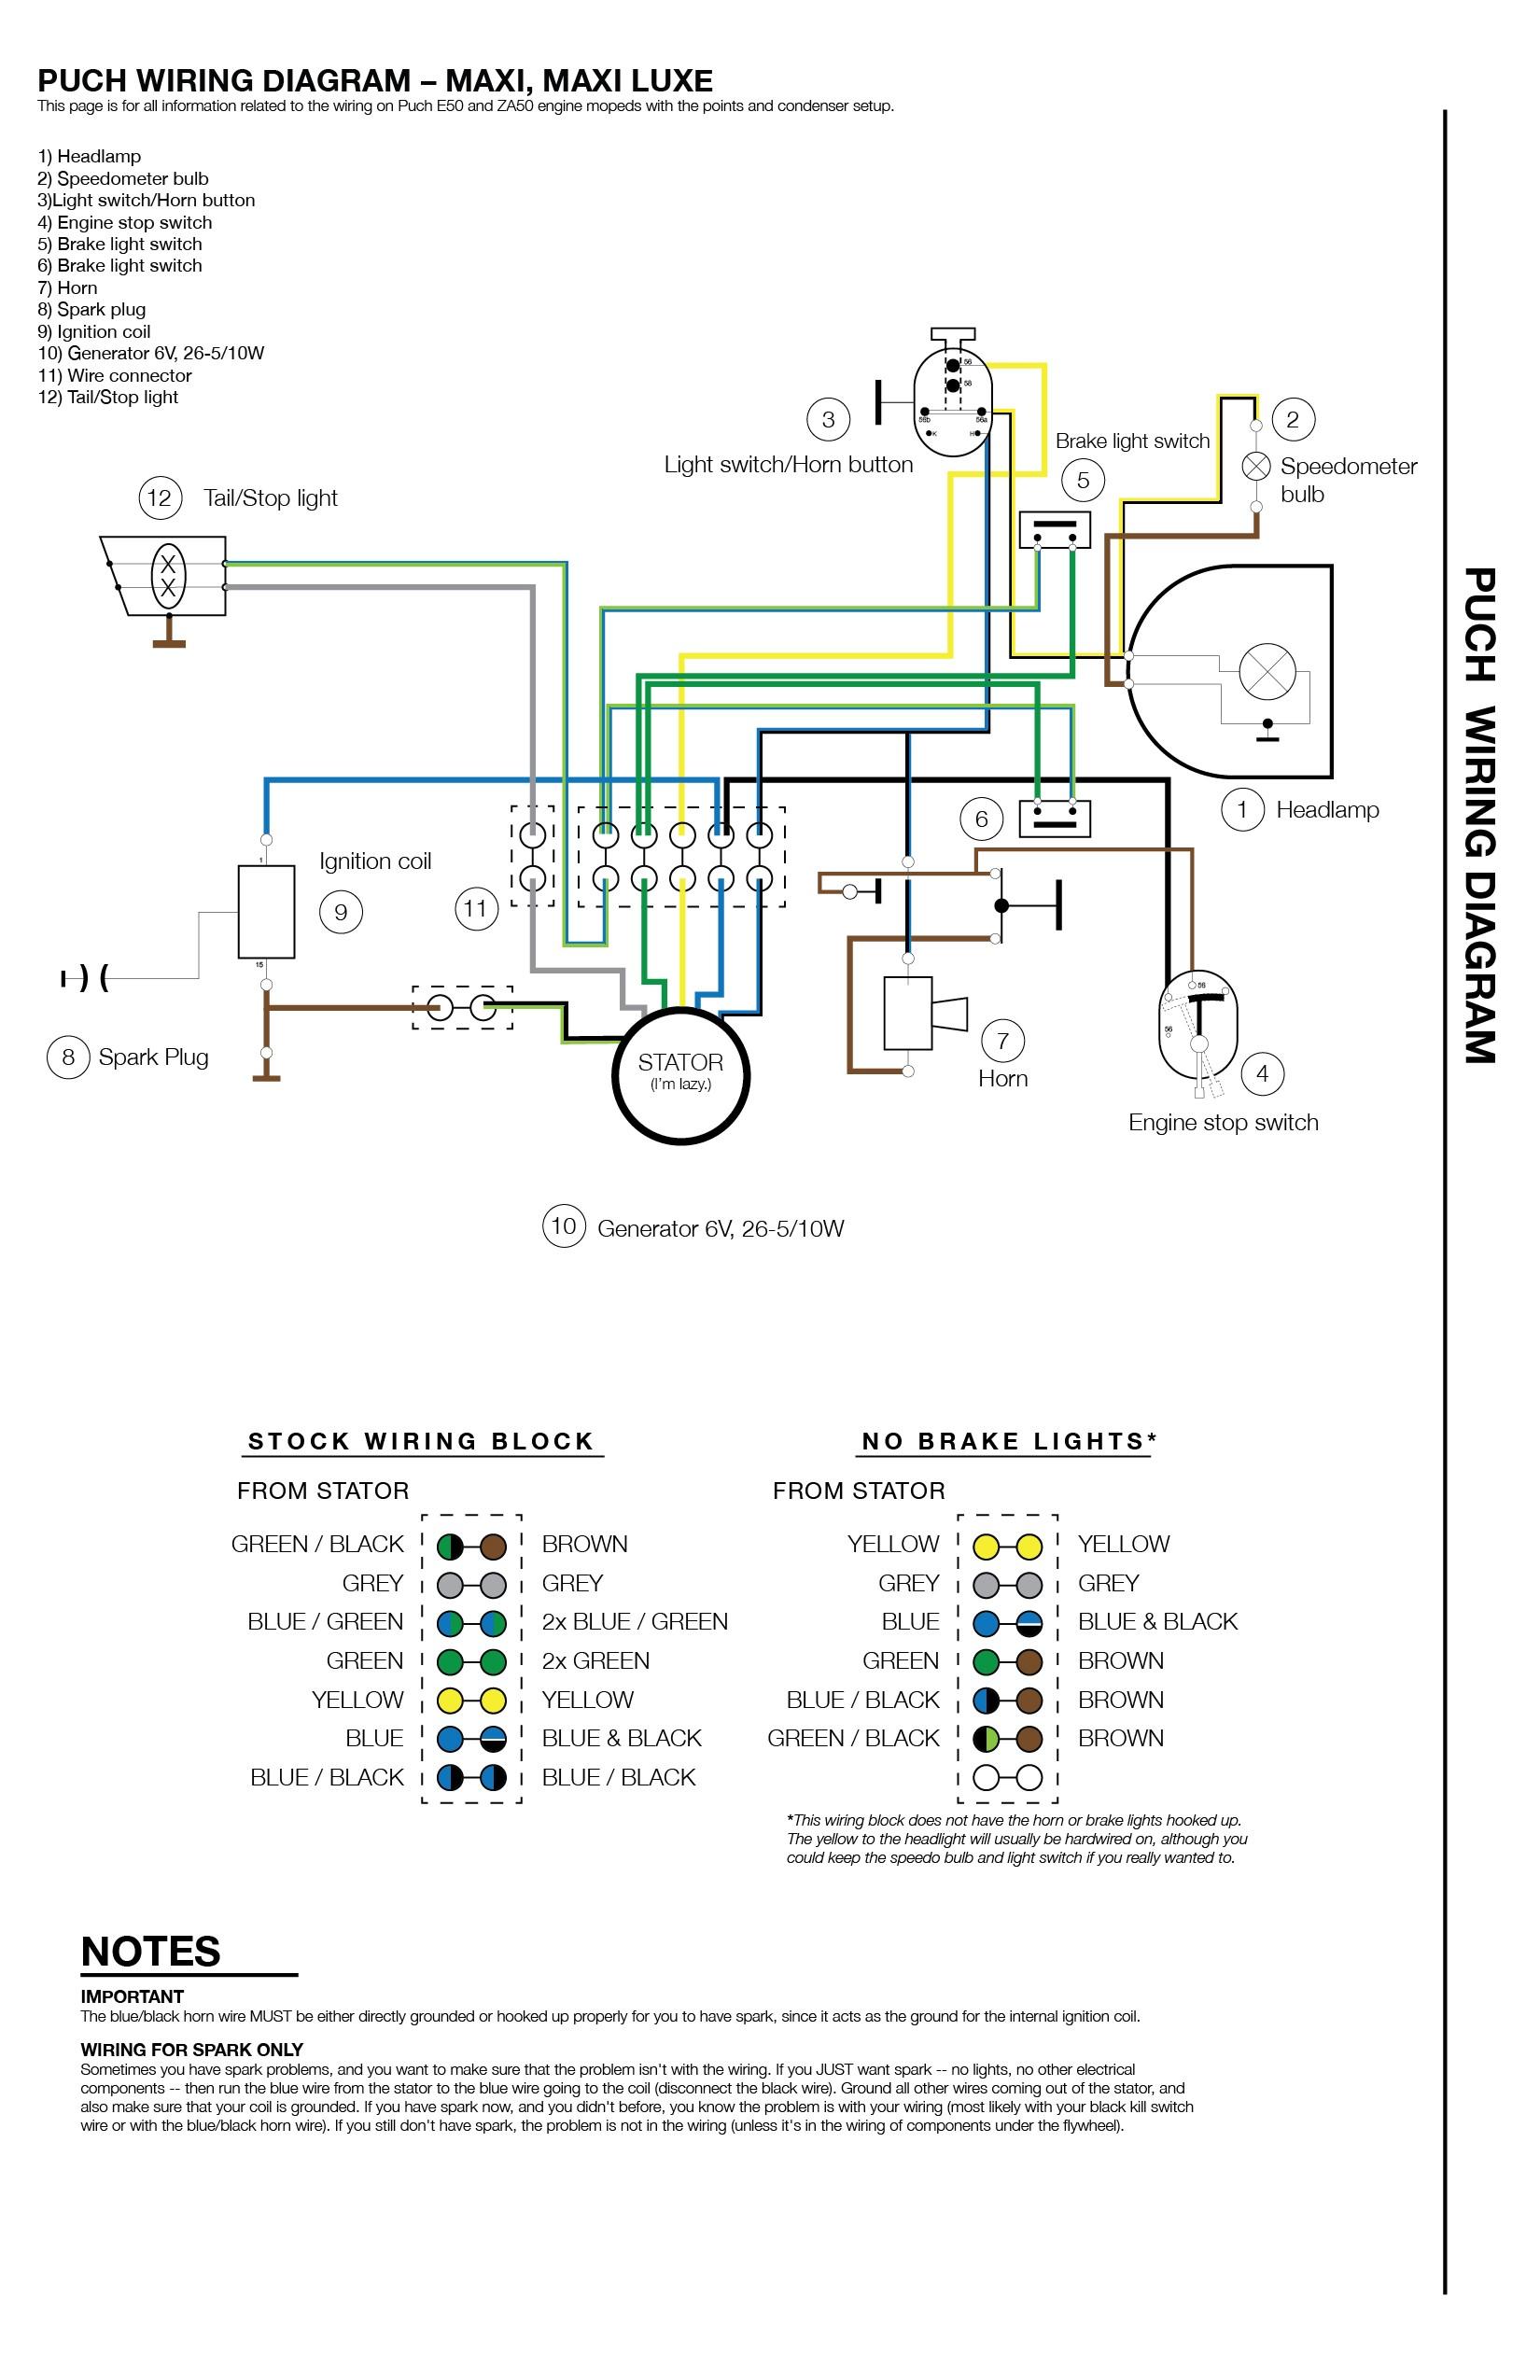 748 ducati ignition wiring diagram 2003 ducati 999 wiring diagram